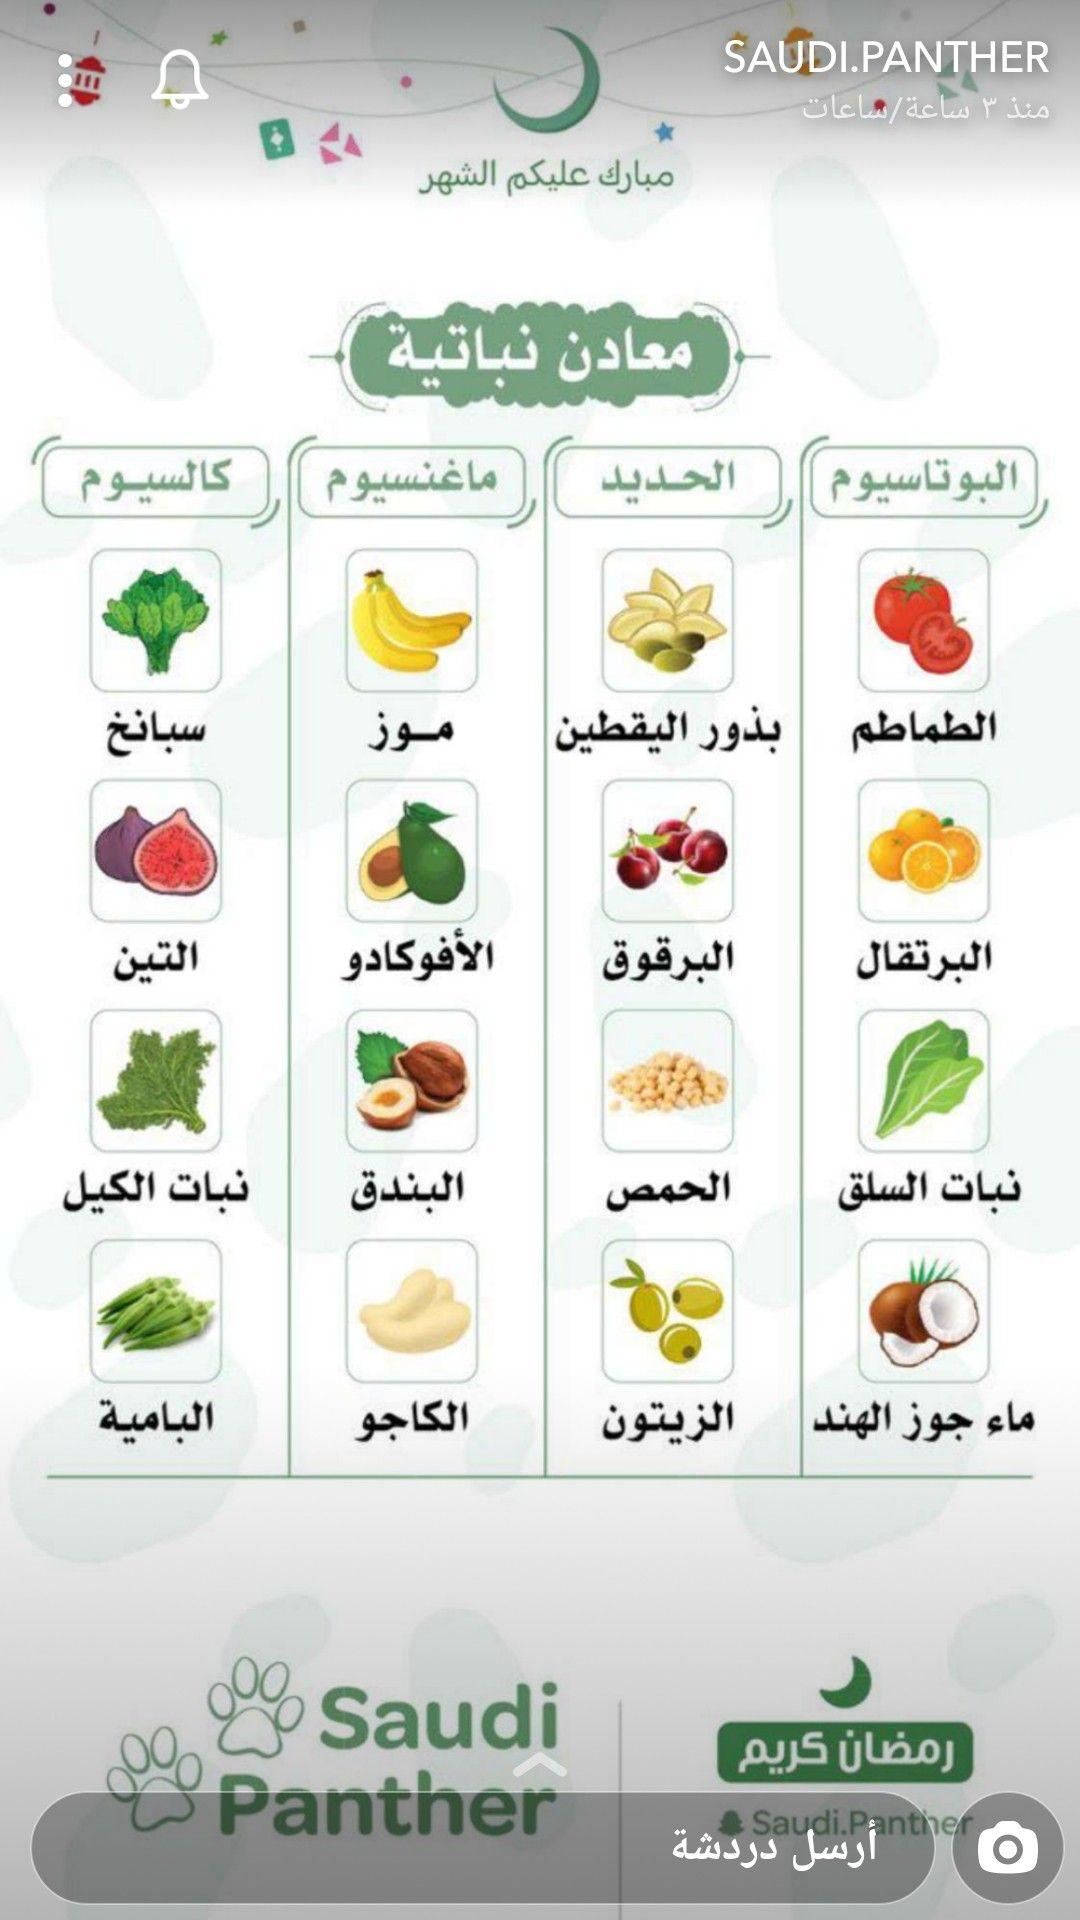 Pin By Sadk On فيتامينات Workout Food Healthy Life Health